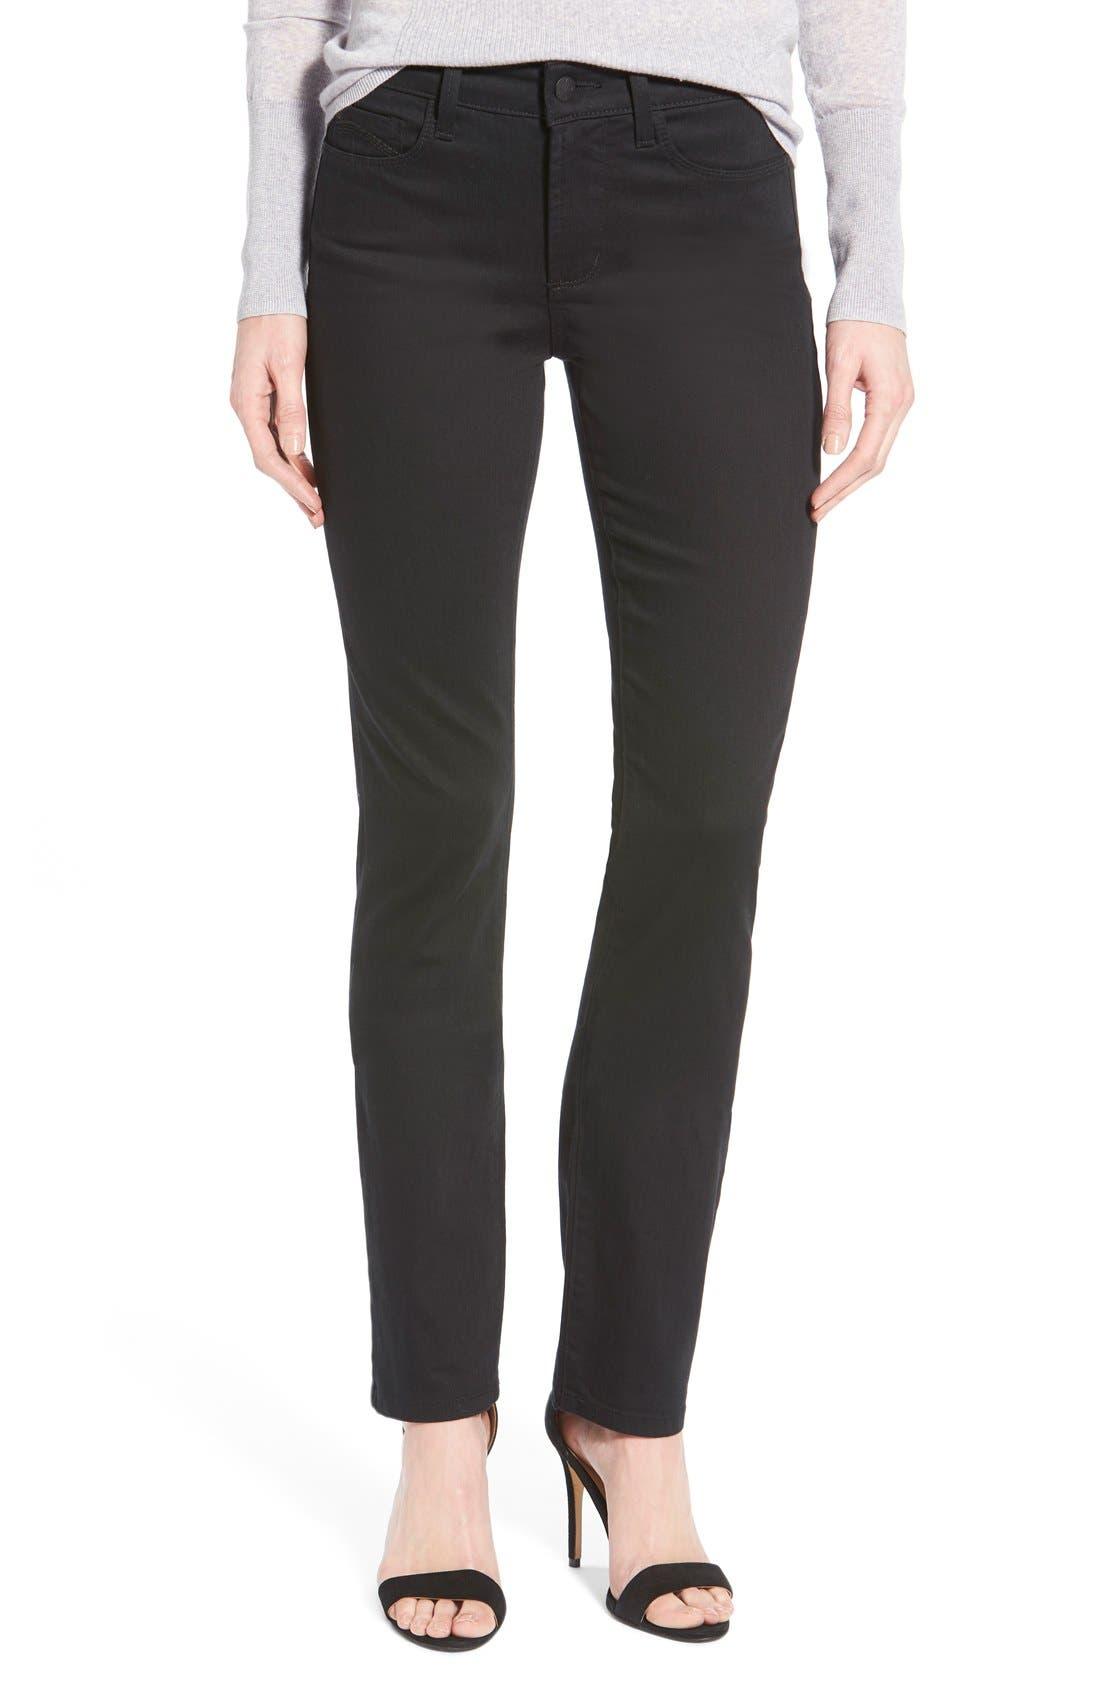 'Samantha' Stretch Slim Straight Leg Jeans,                             Main thumbnail 1, color,                             001